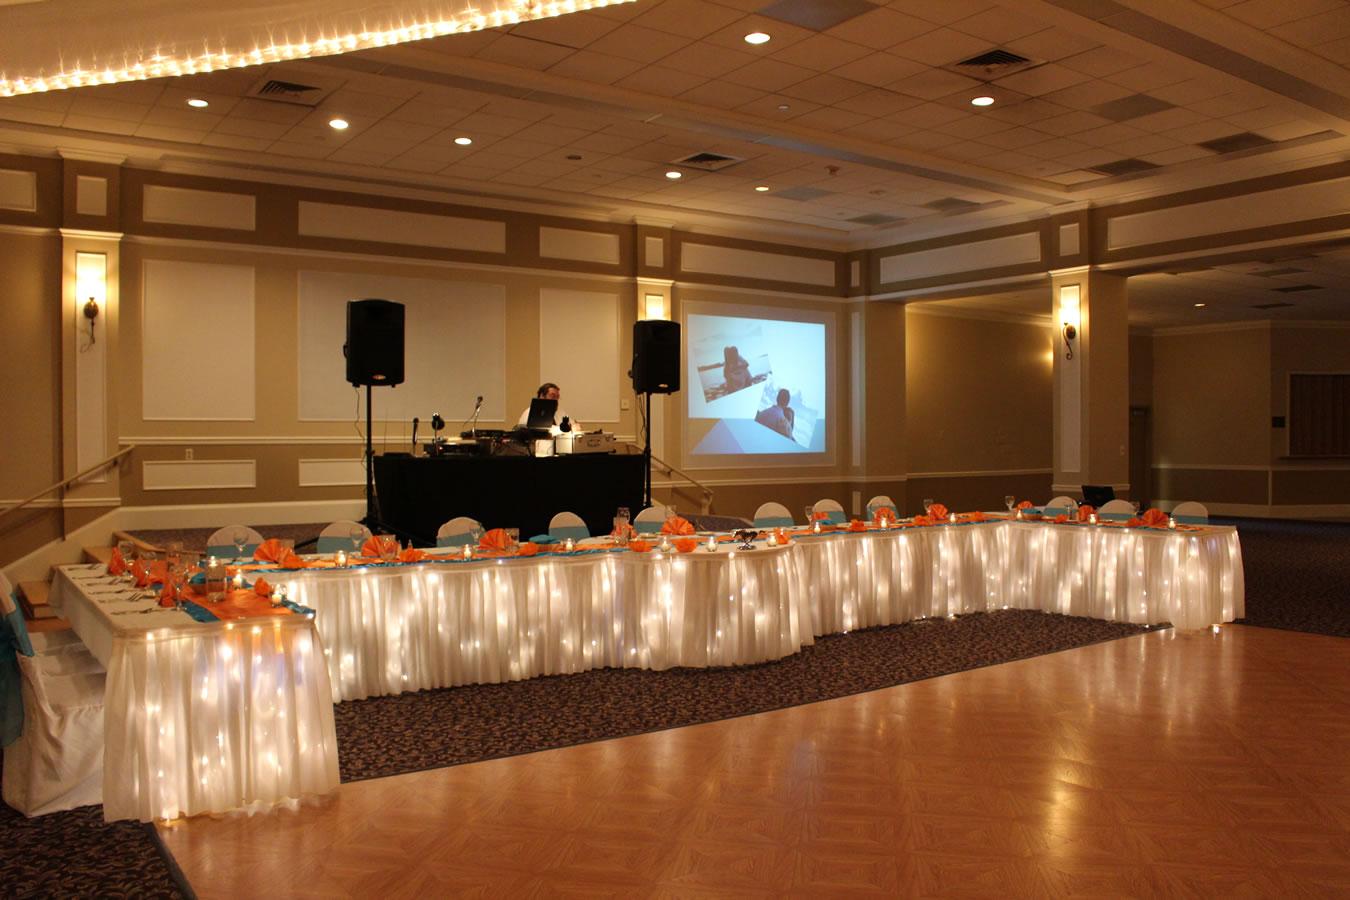 Wedding Receptions Amp Banquet Hall Hockessin Memorial Hall